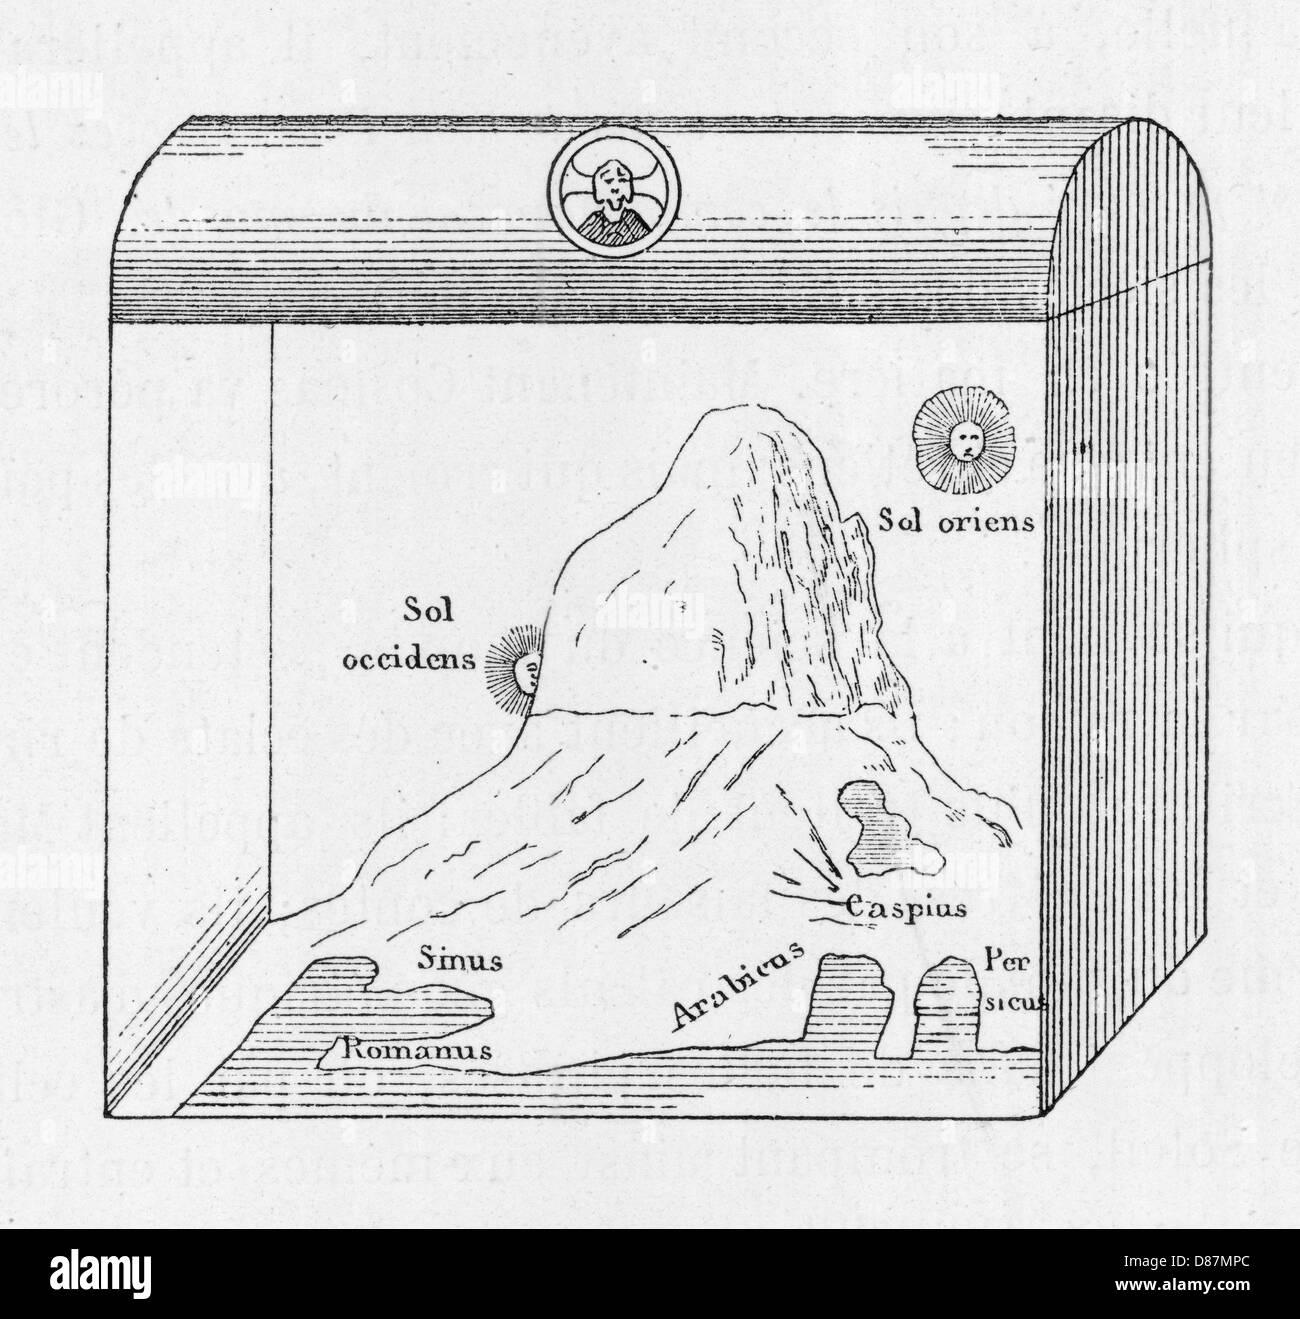 System Of Cosmas - Stock Image